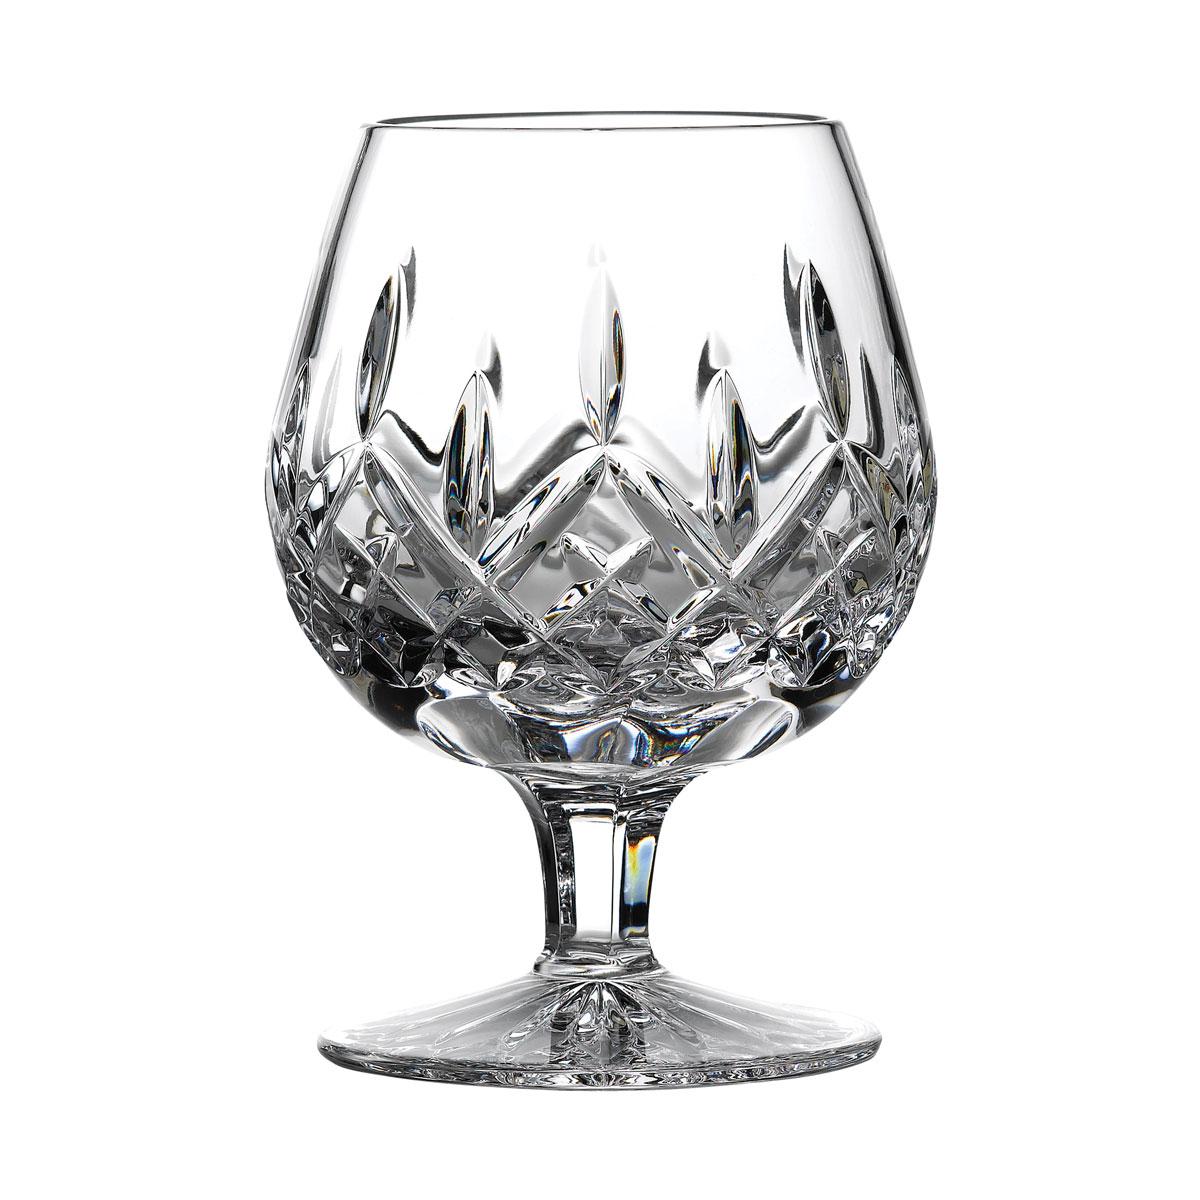 Waterford Crystal, Lismore Large Brandy, Single